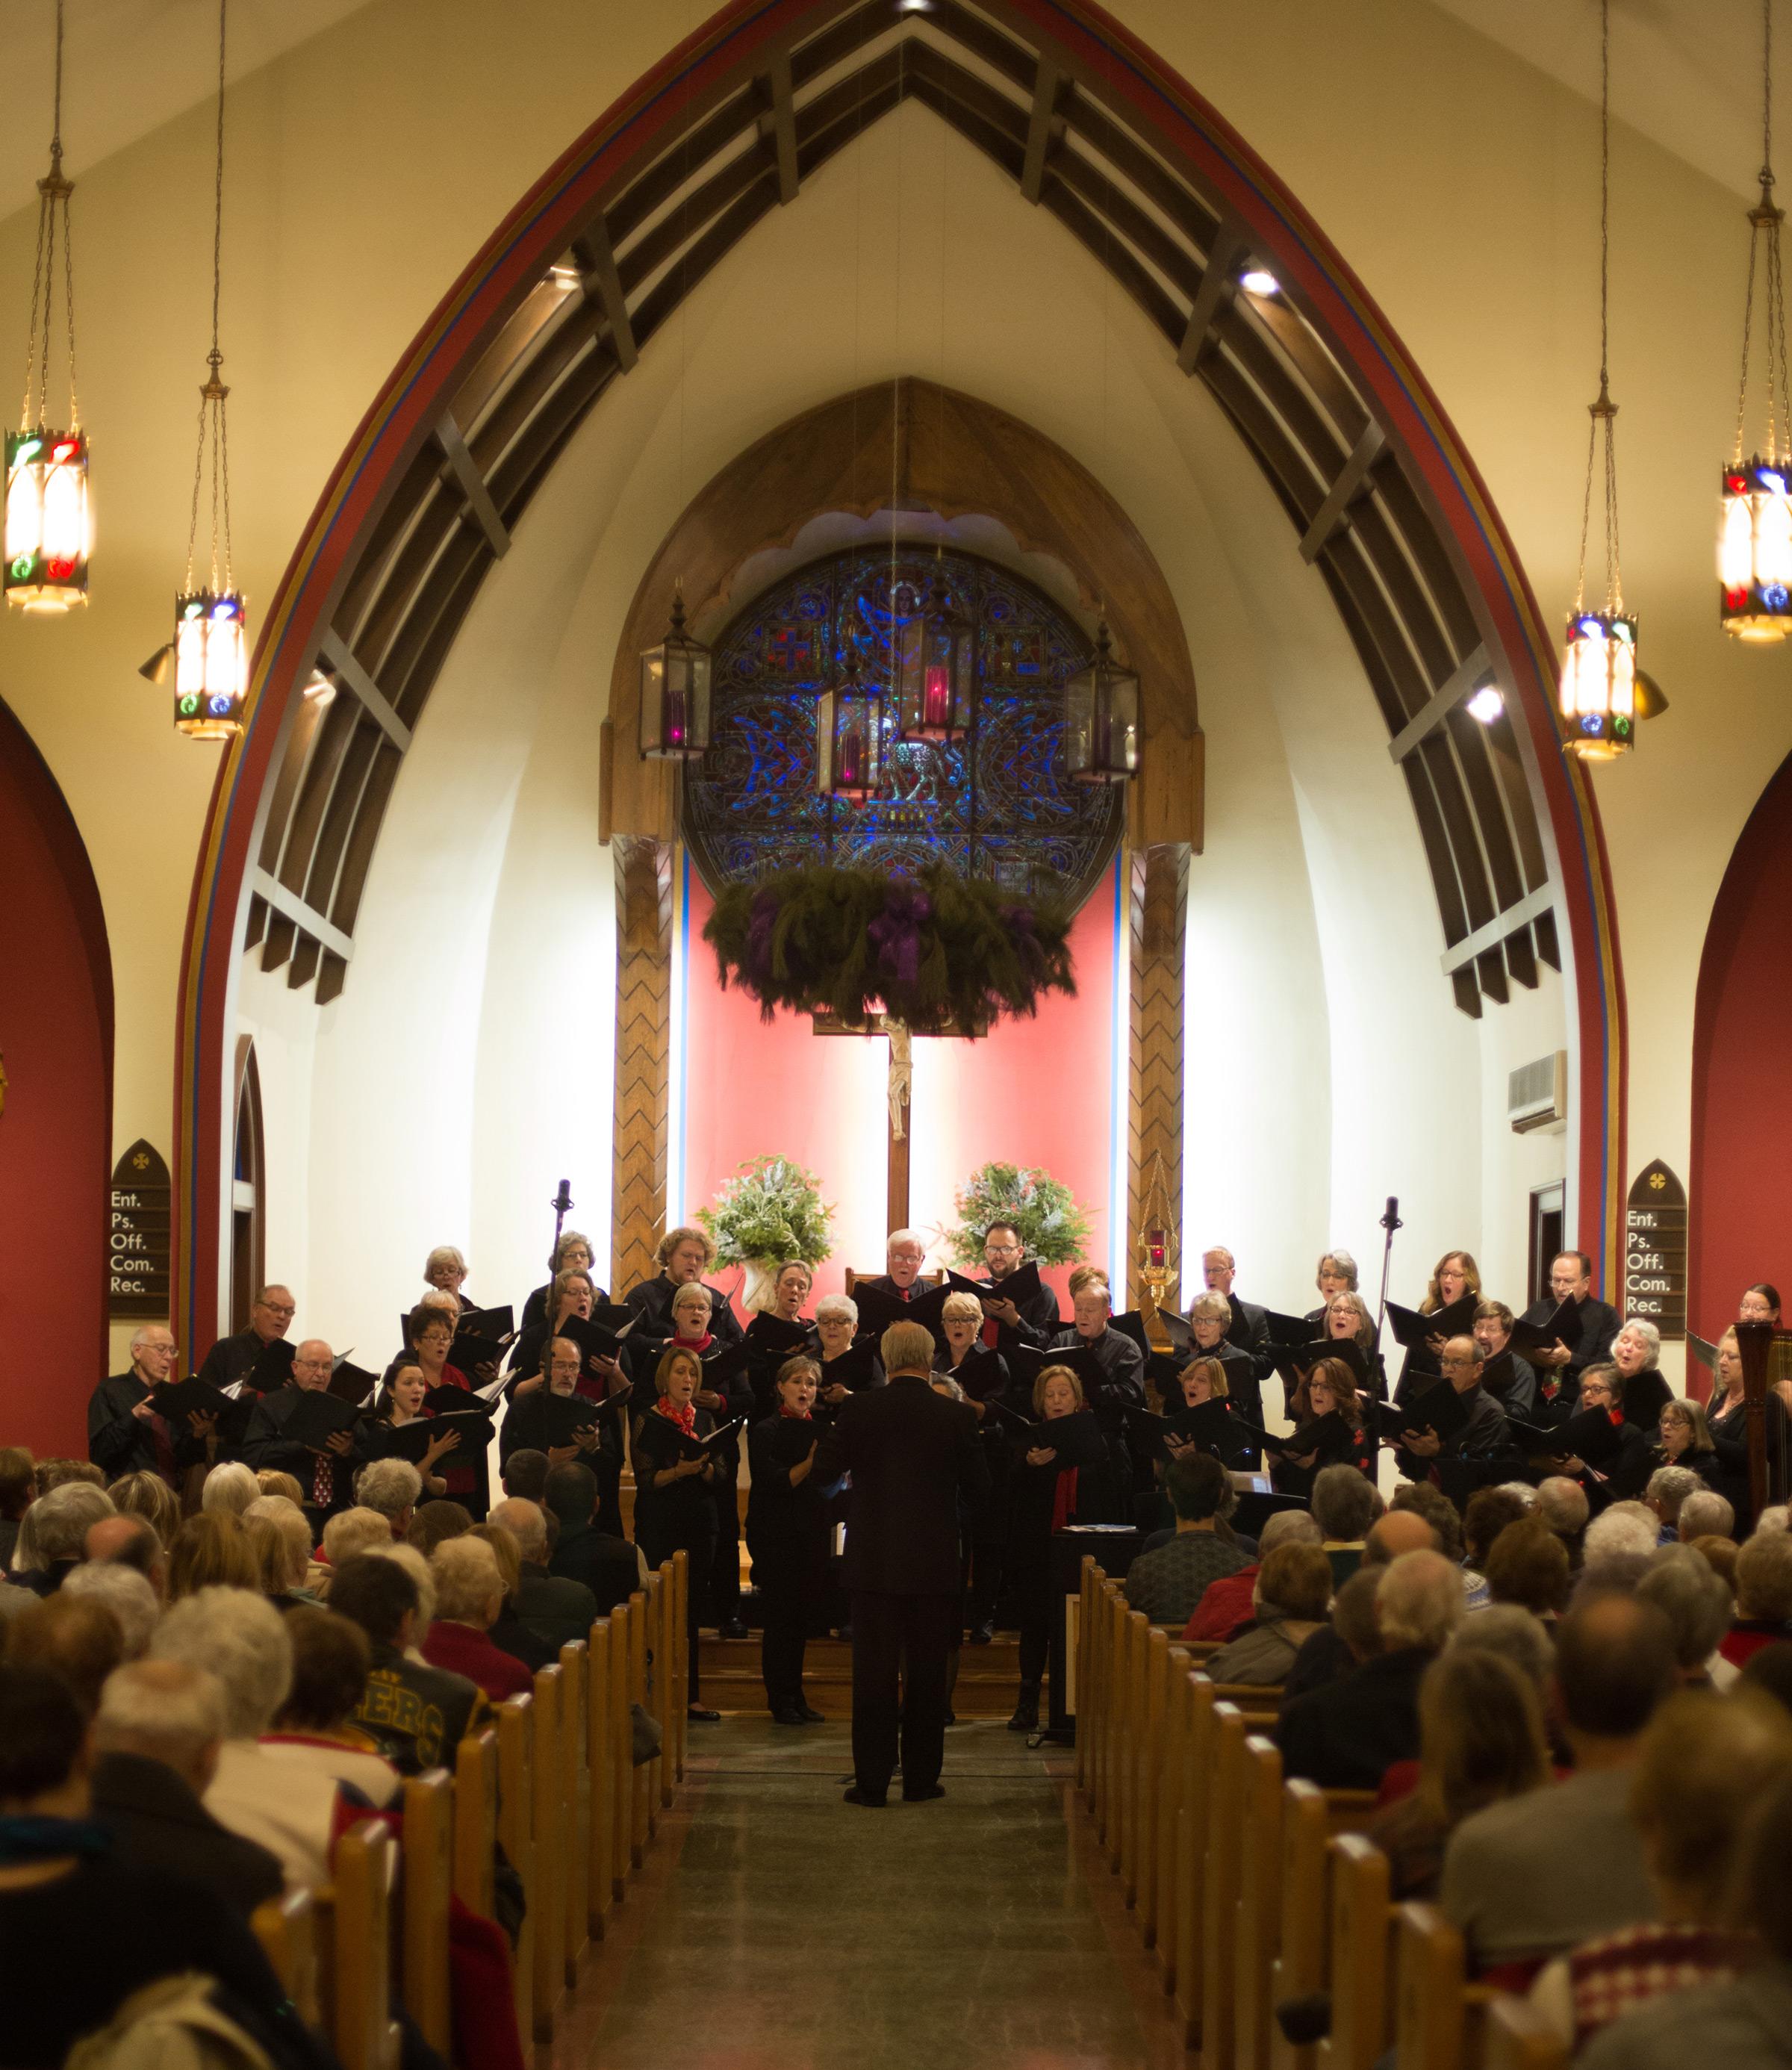 Bel Canto 2018 Christmas Concert